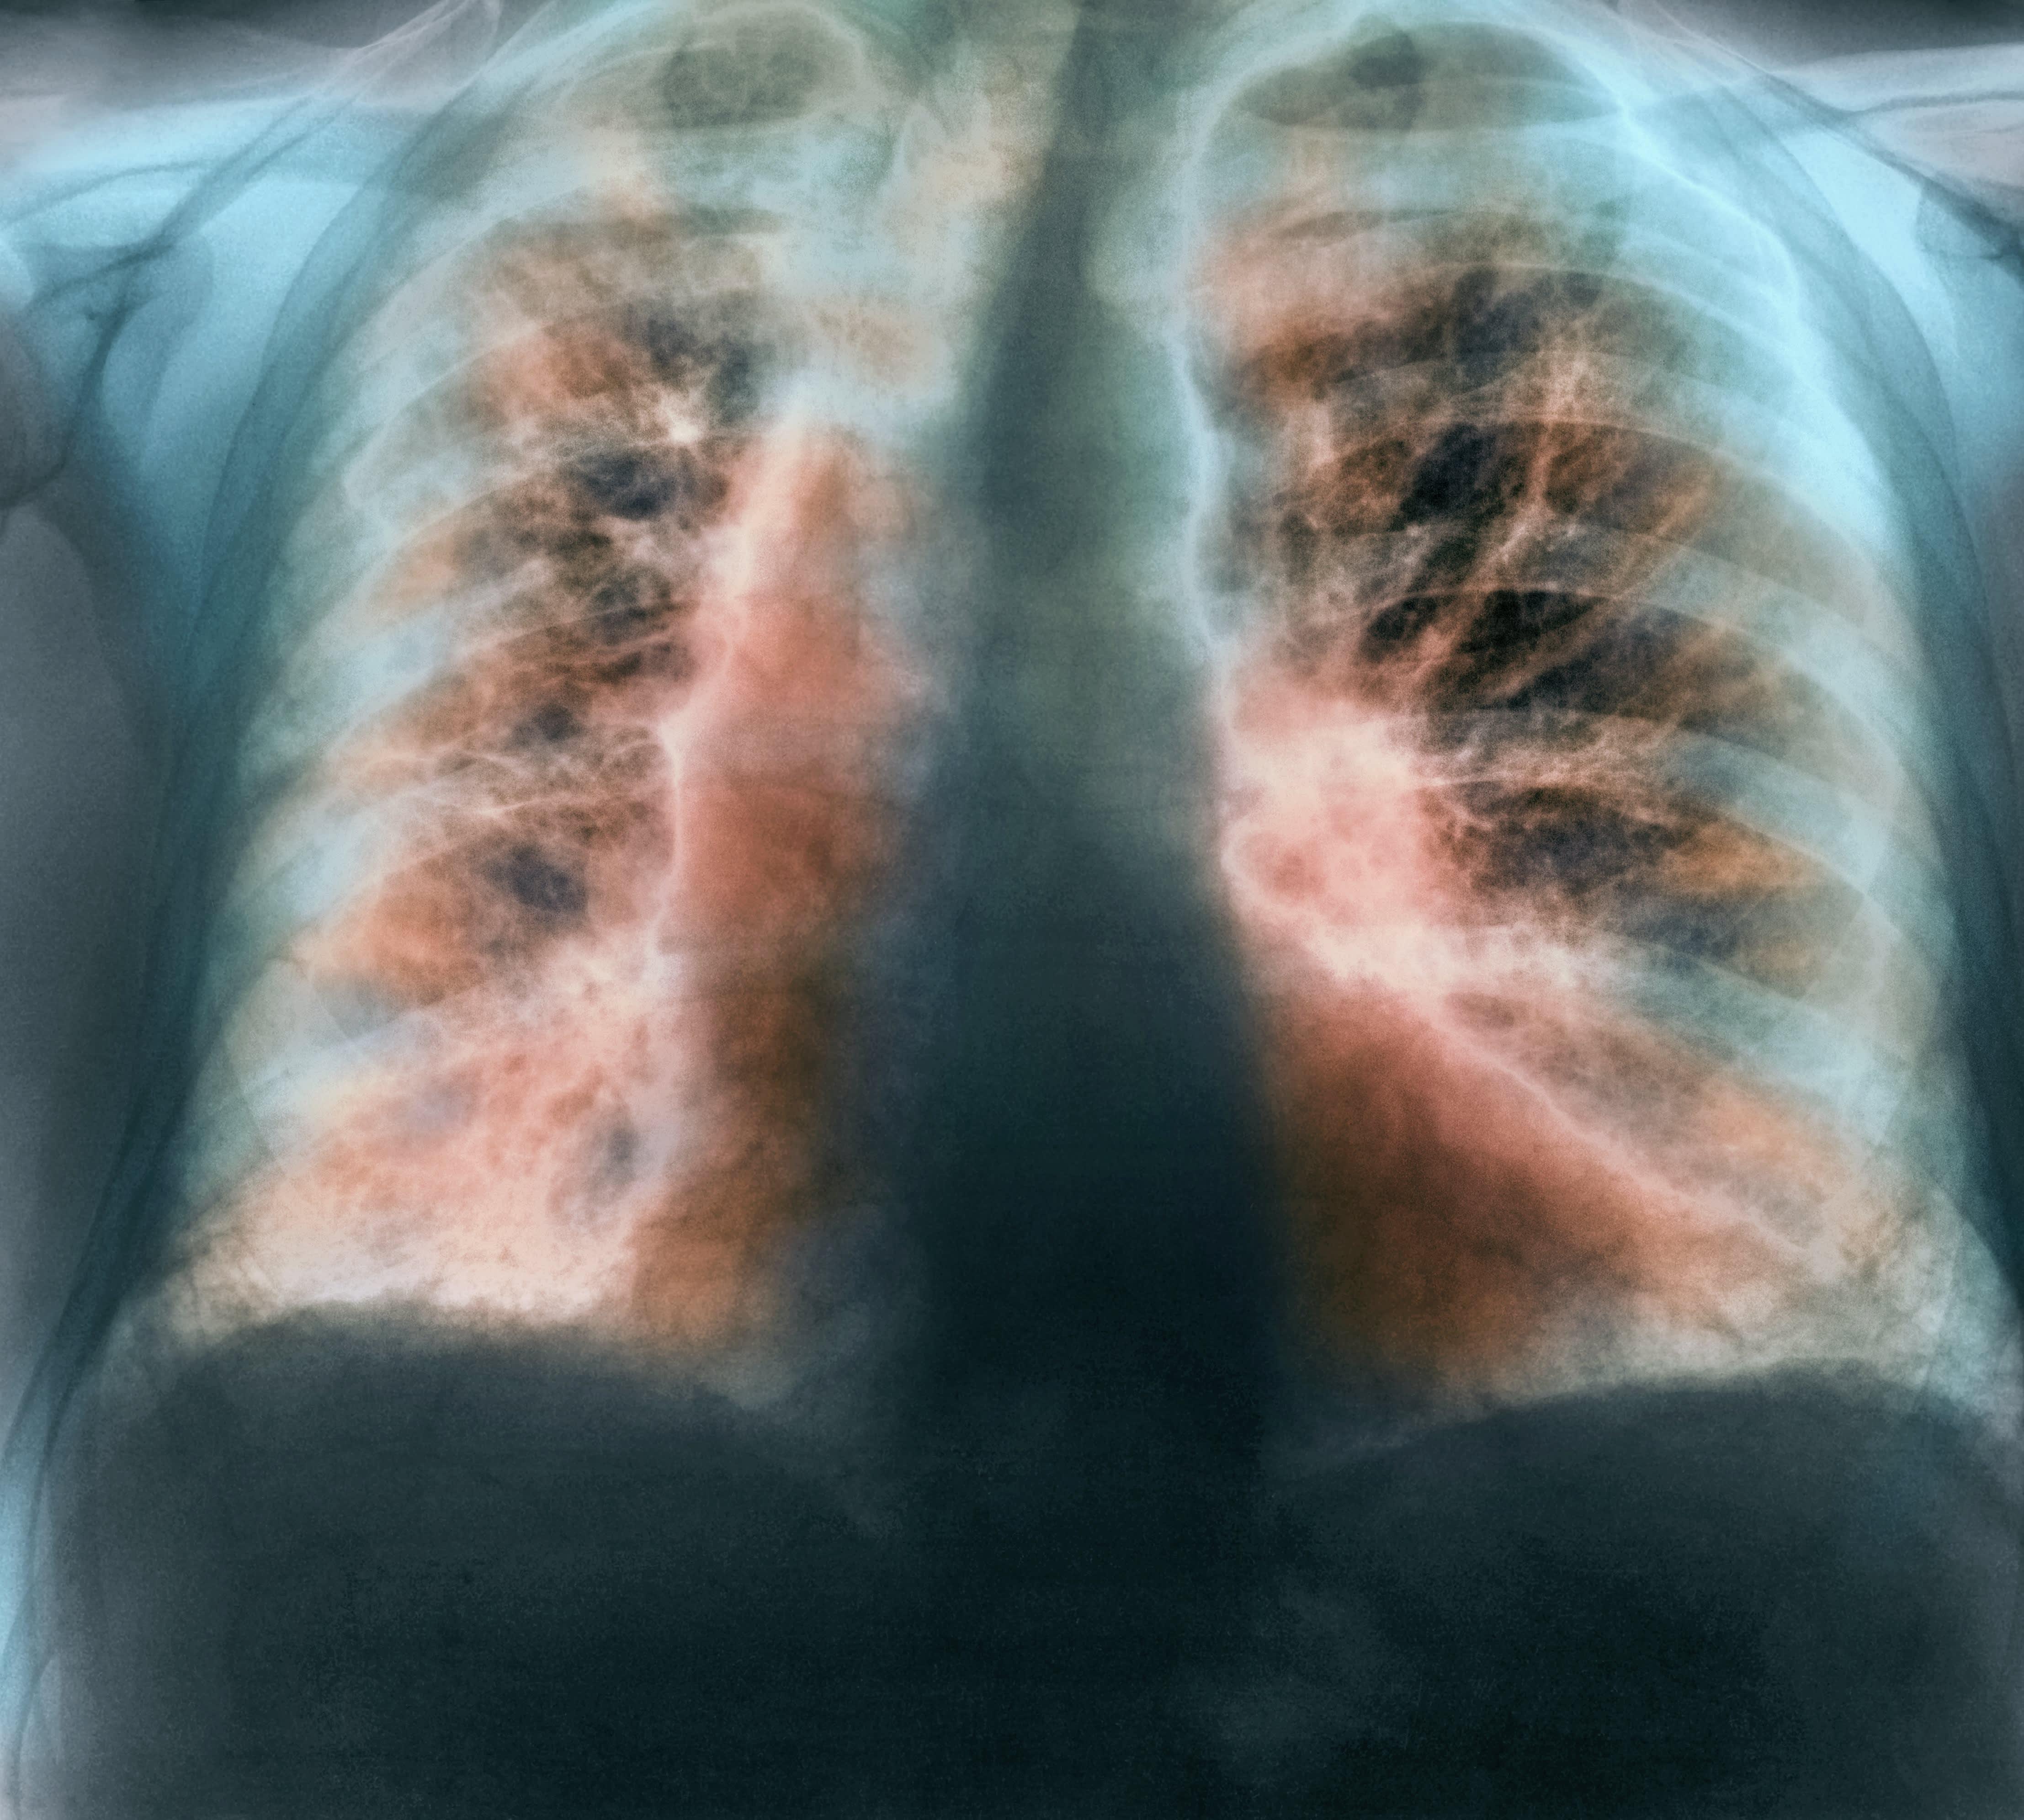 Biotech Fibrogen Soars On Positive Lung Disease Treatment